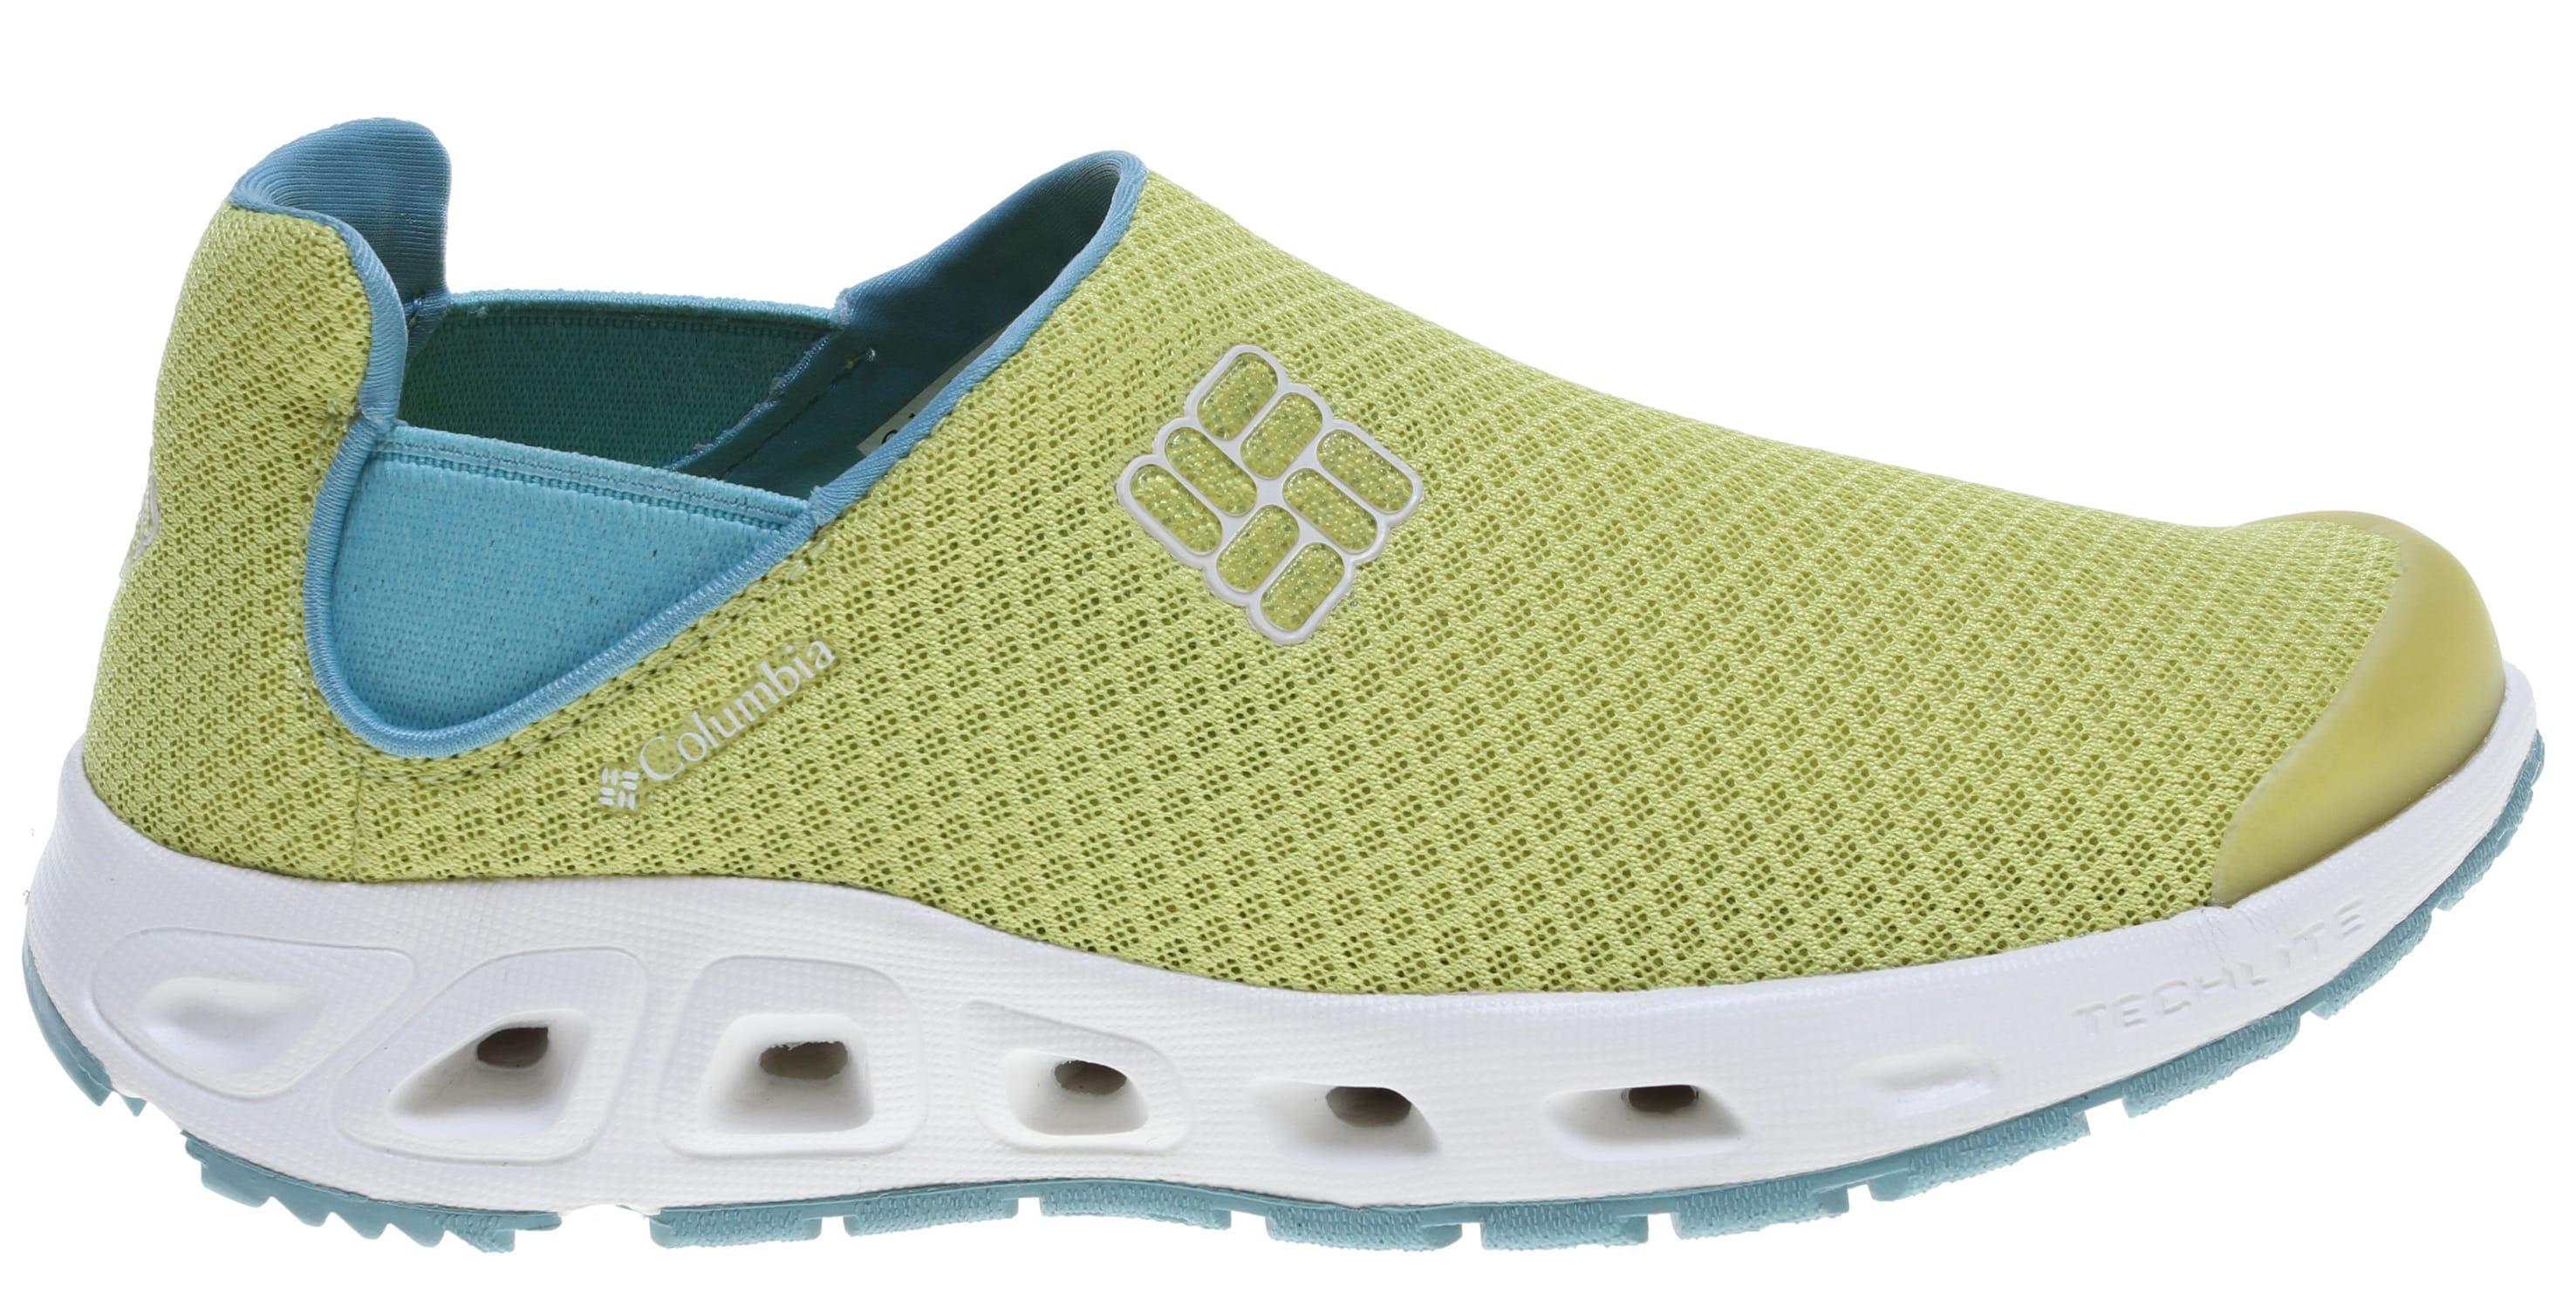 Columbia Drainslip II Water Shoes - Womens